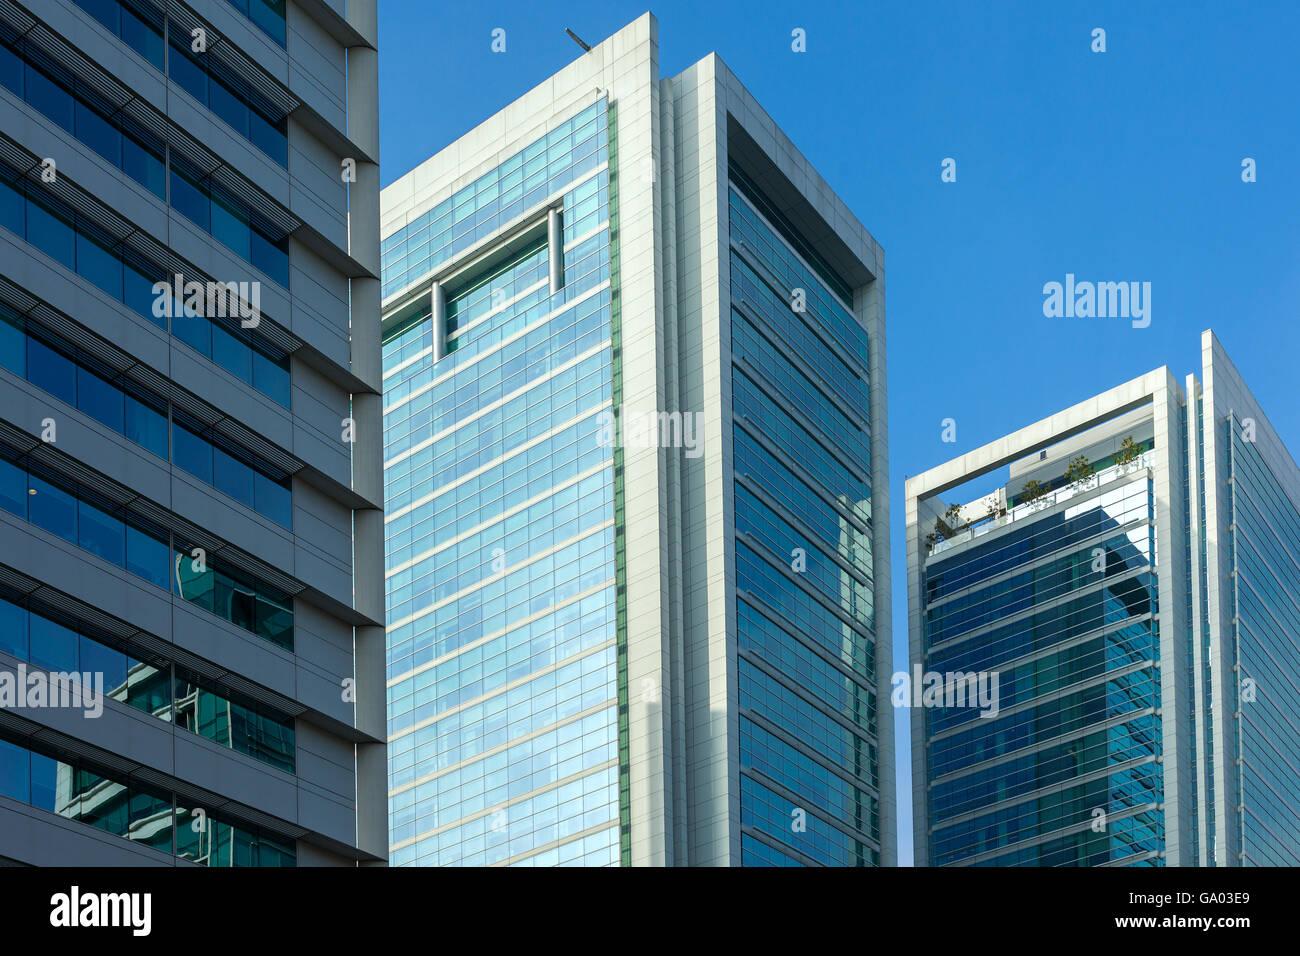 Moderne Gebäude im wohlhabenden Stadtteil Isidora Goyenechea, Santiago de Chile Stockbild